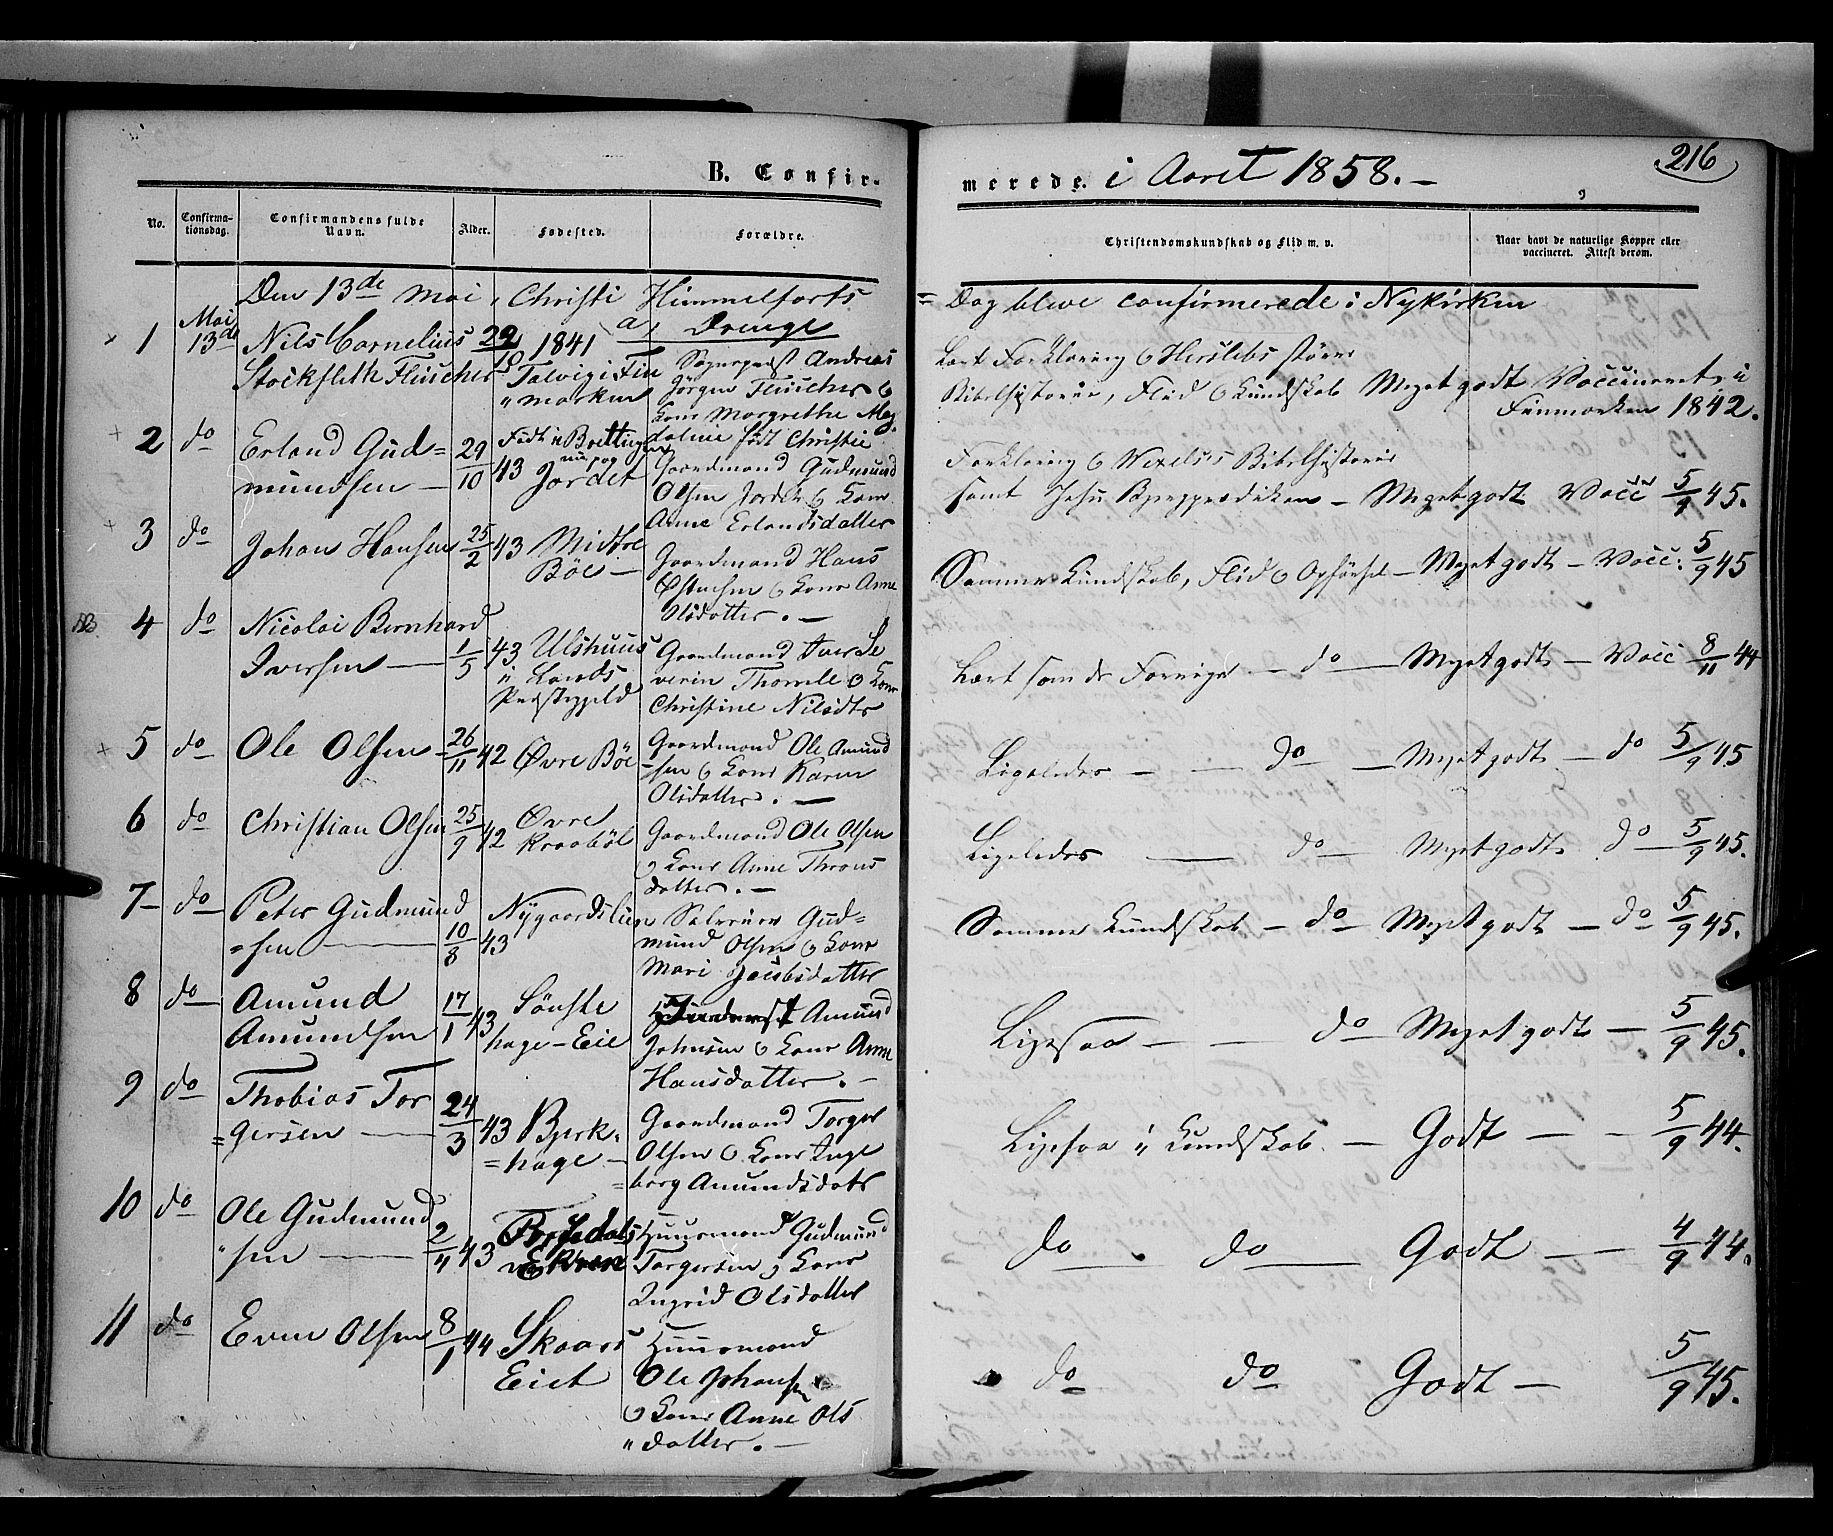 SAH, Gausdal prestekontor, Ministerialbok nr. 8, 1850-1861, s. 216